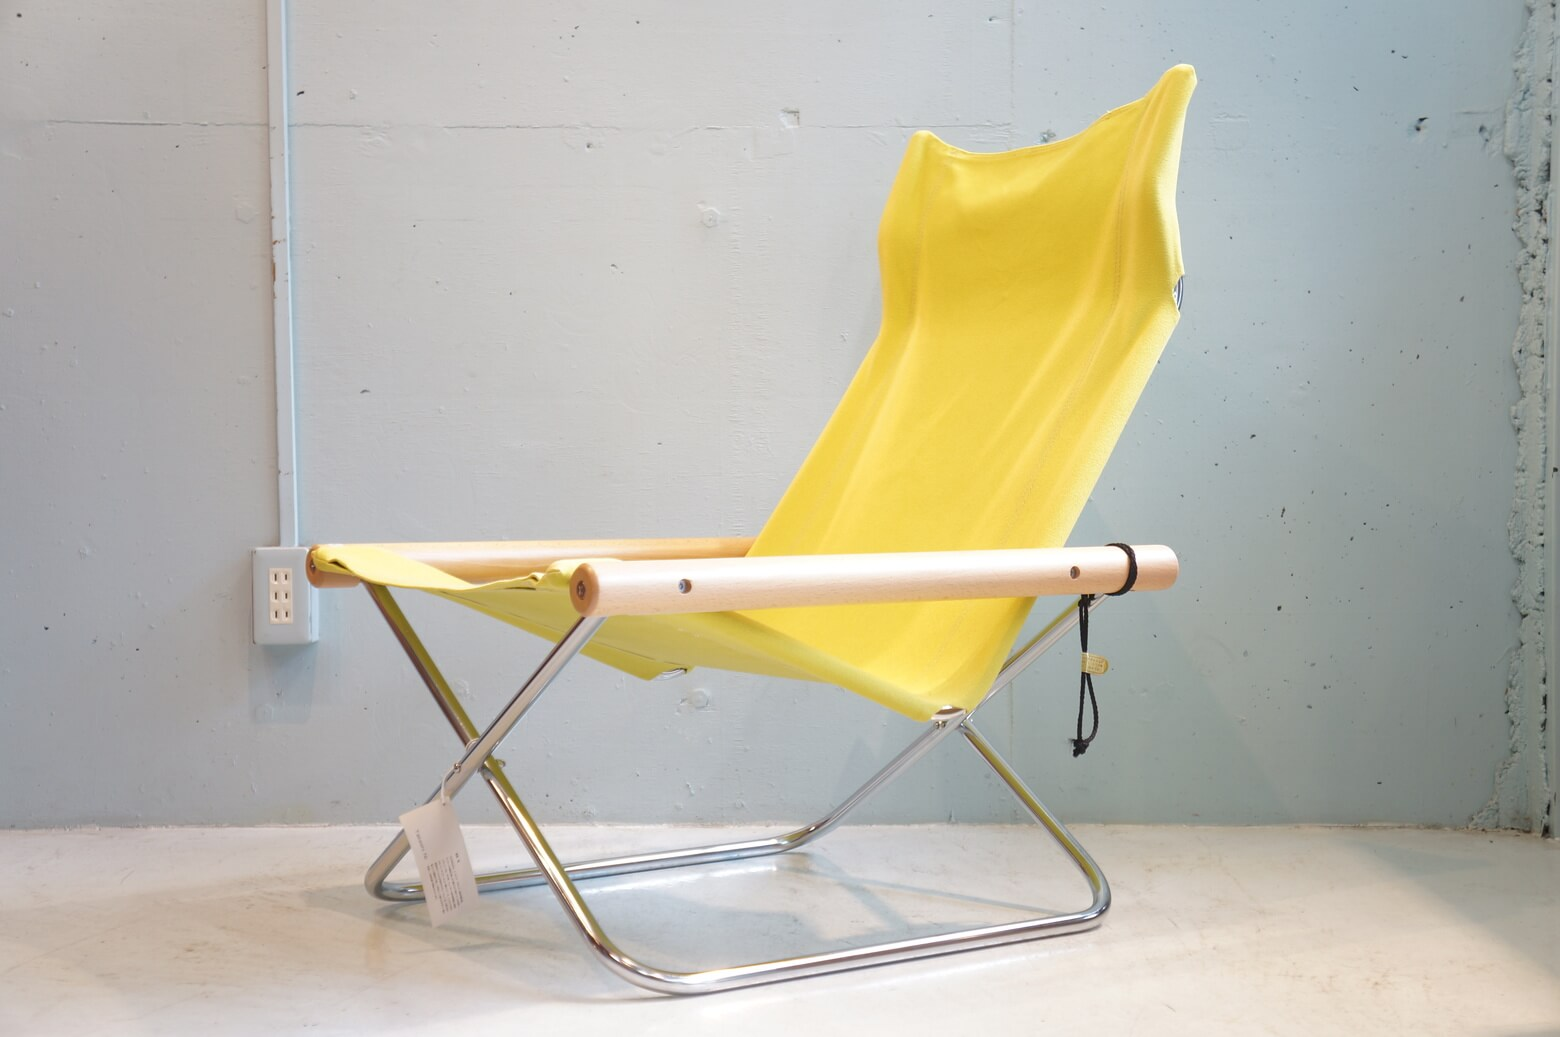 Ny Chair Light Green/ニーチェア ライトグリーン